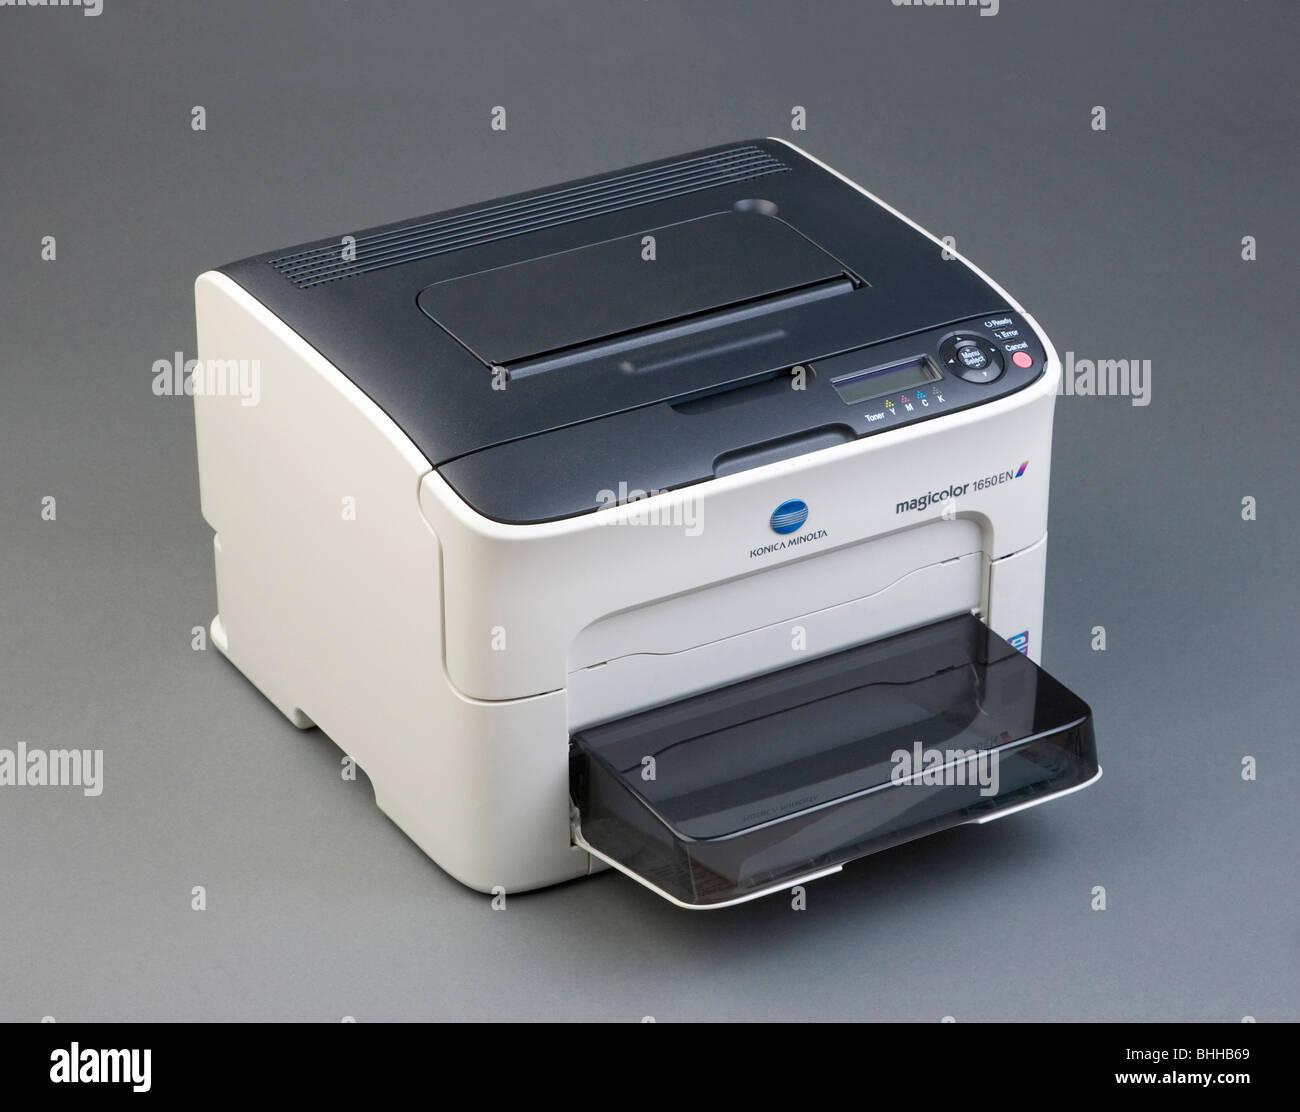 Konica Minolta Magicolor 1650EN colour laser printer